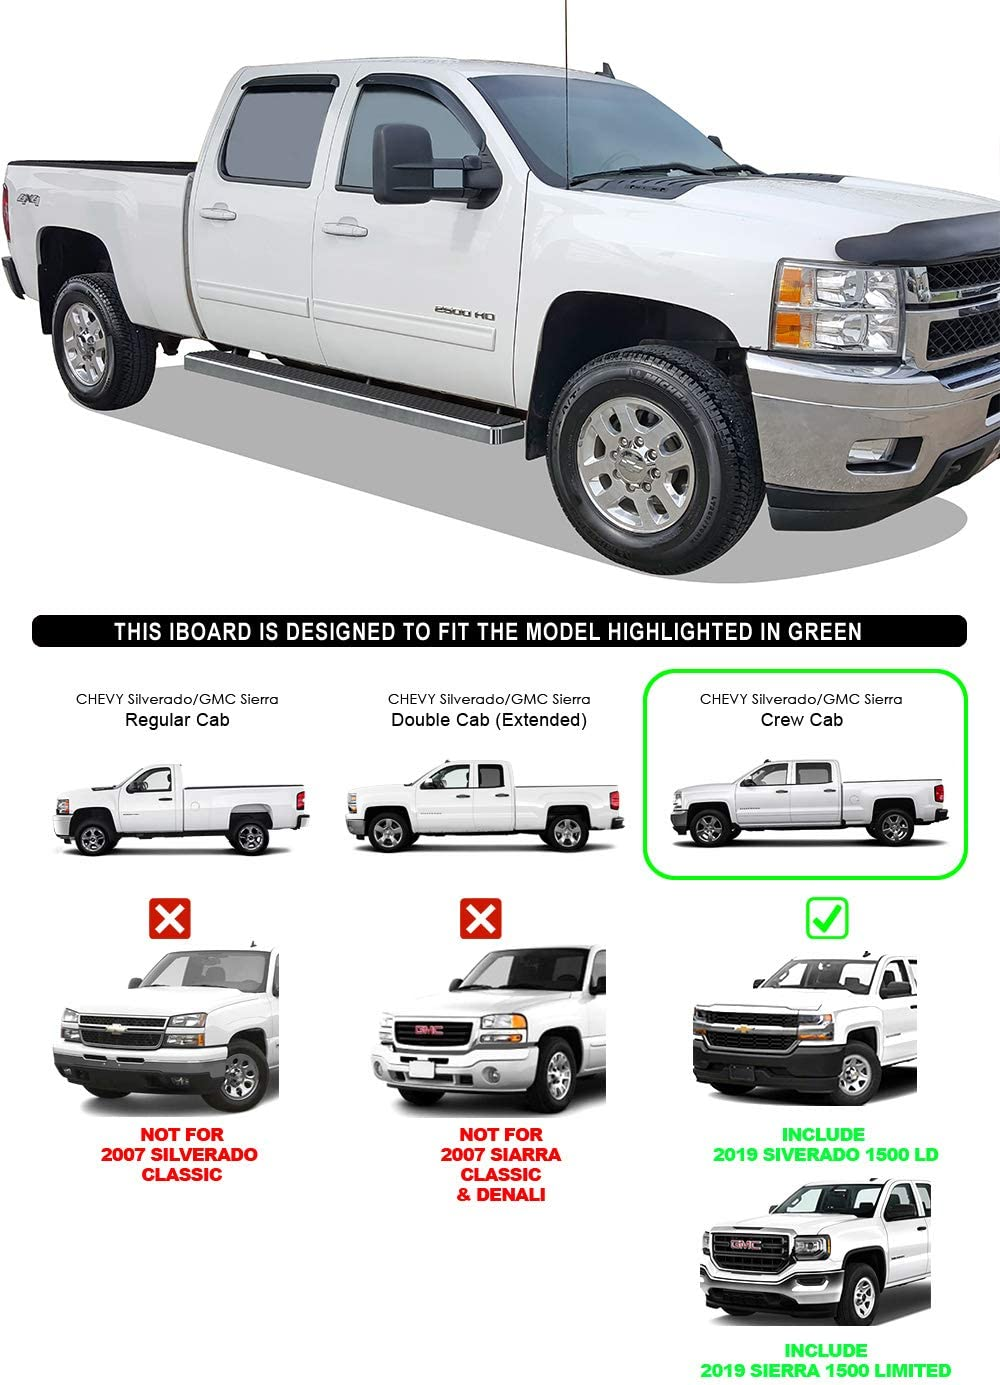 A2901 A2866 A2818 A2906 A2866 K1755 Fits 2000-2005 Chevrolet Impala 3.4L Engine Motor /& Trans Mount Set 6pcs : A2901